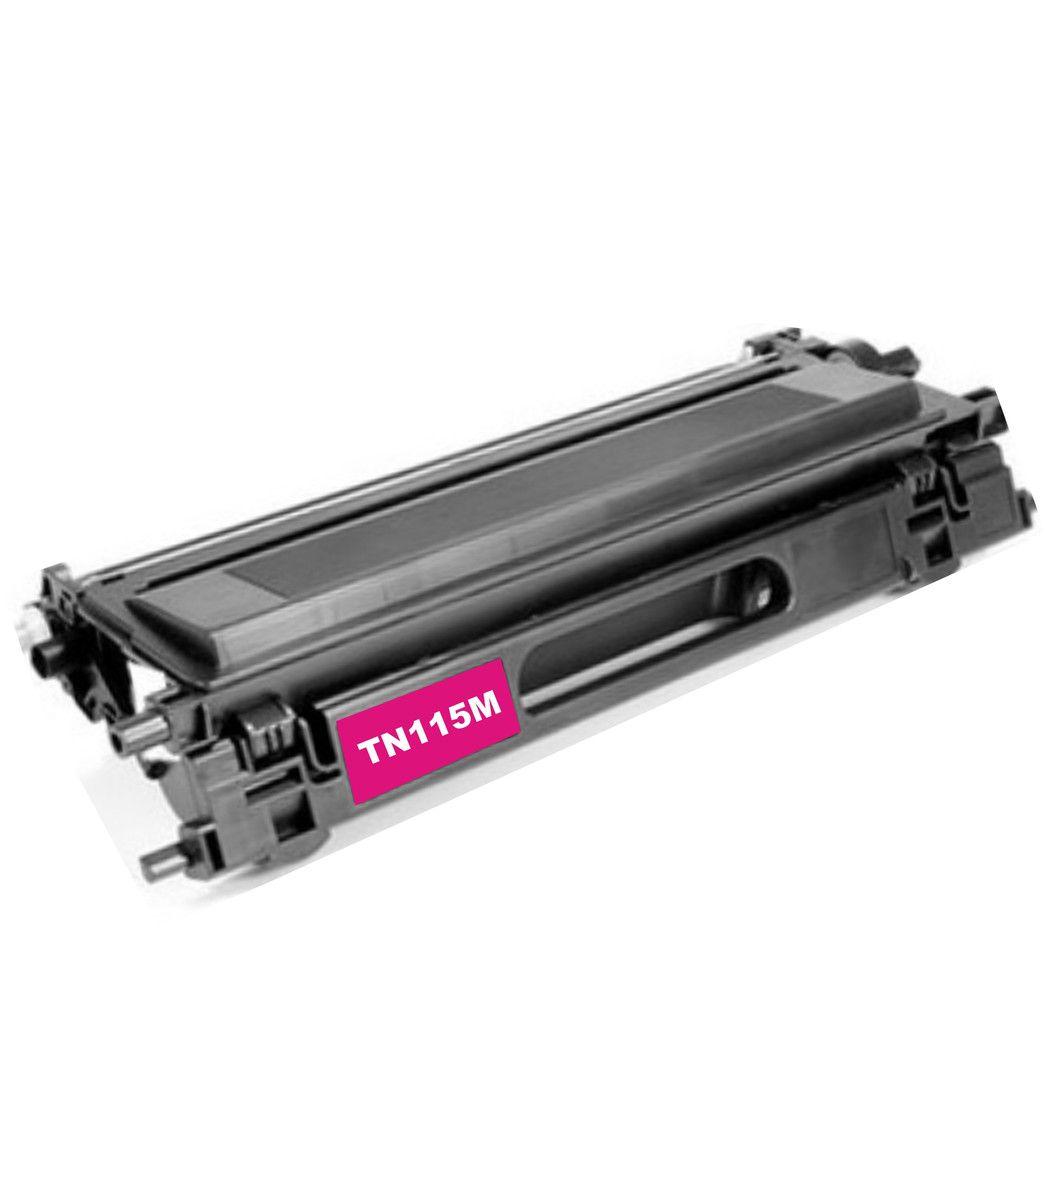 Toner Compatível BROTHER TN115-MAGENTA (HL4040/TN) 4.000 Páginas - Cartucho & Cia